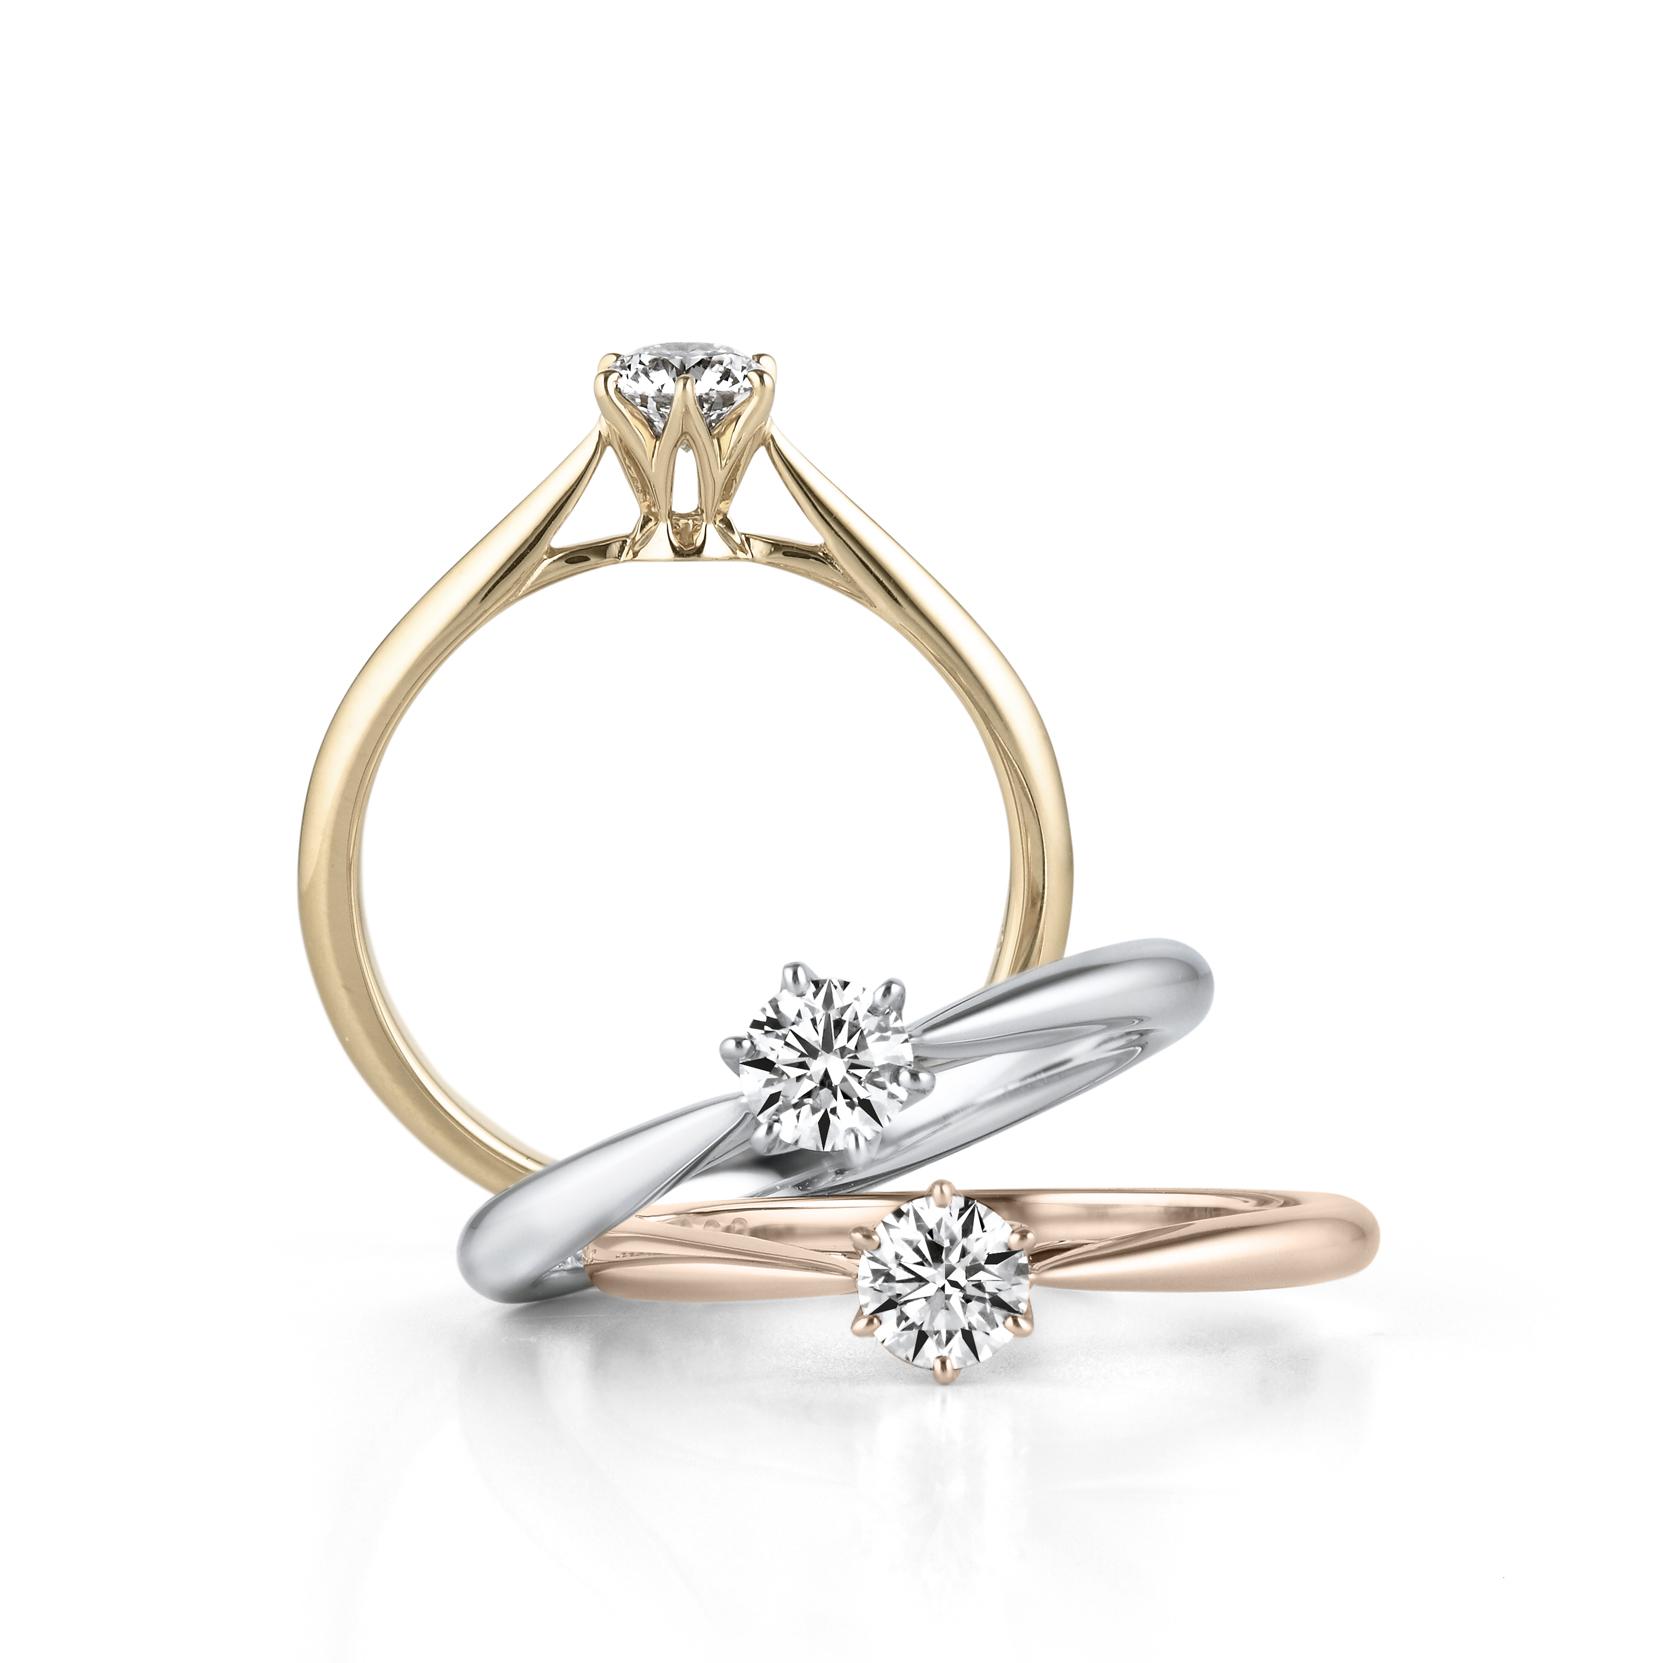 Saint glare,最美麗地展示鑽石的「極致的簡約」